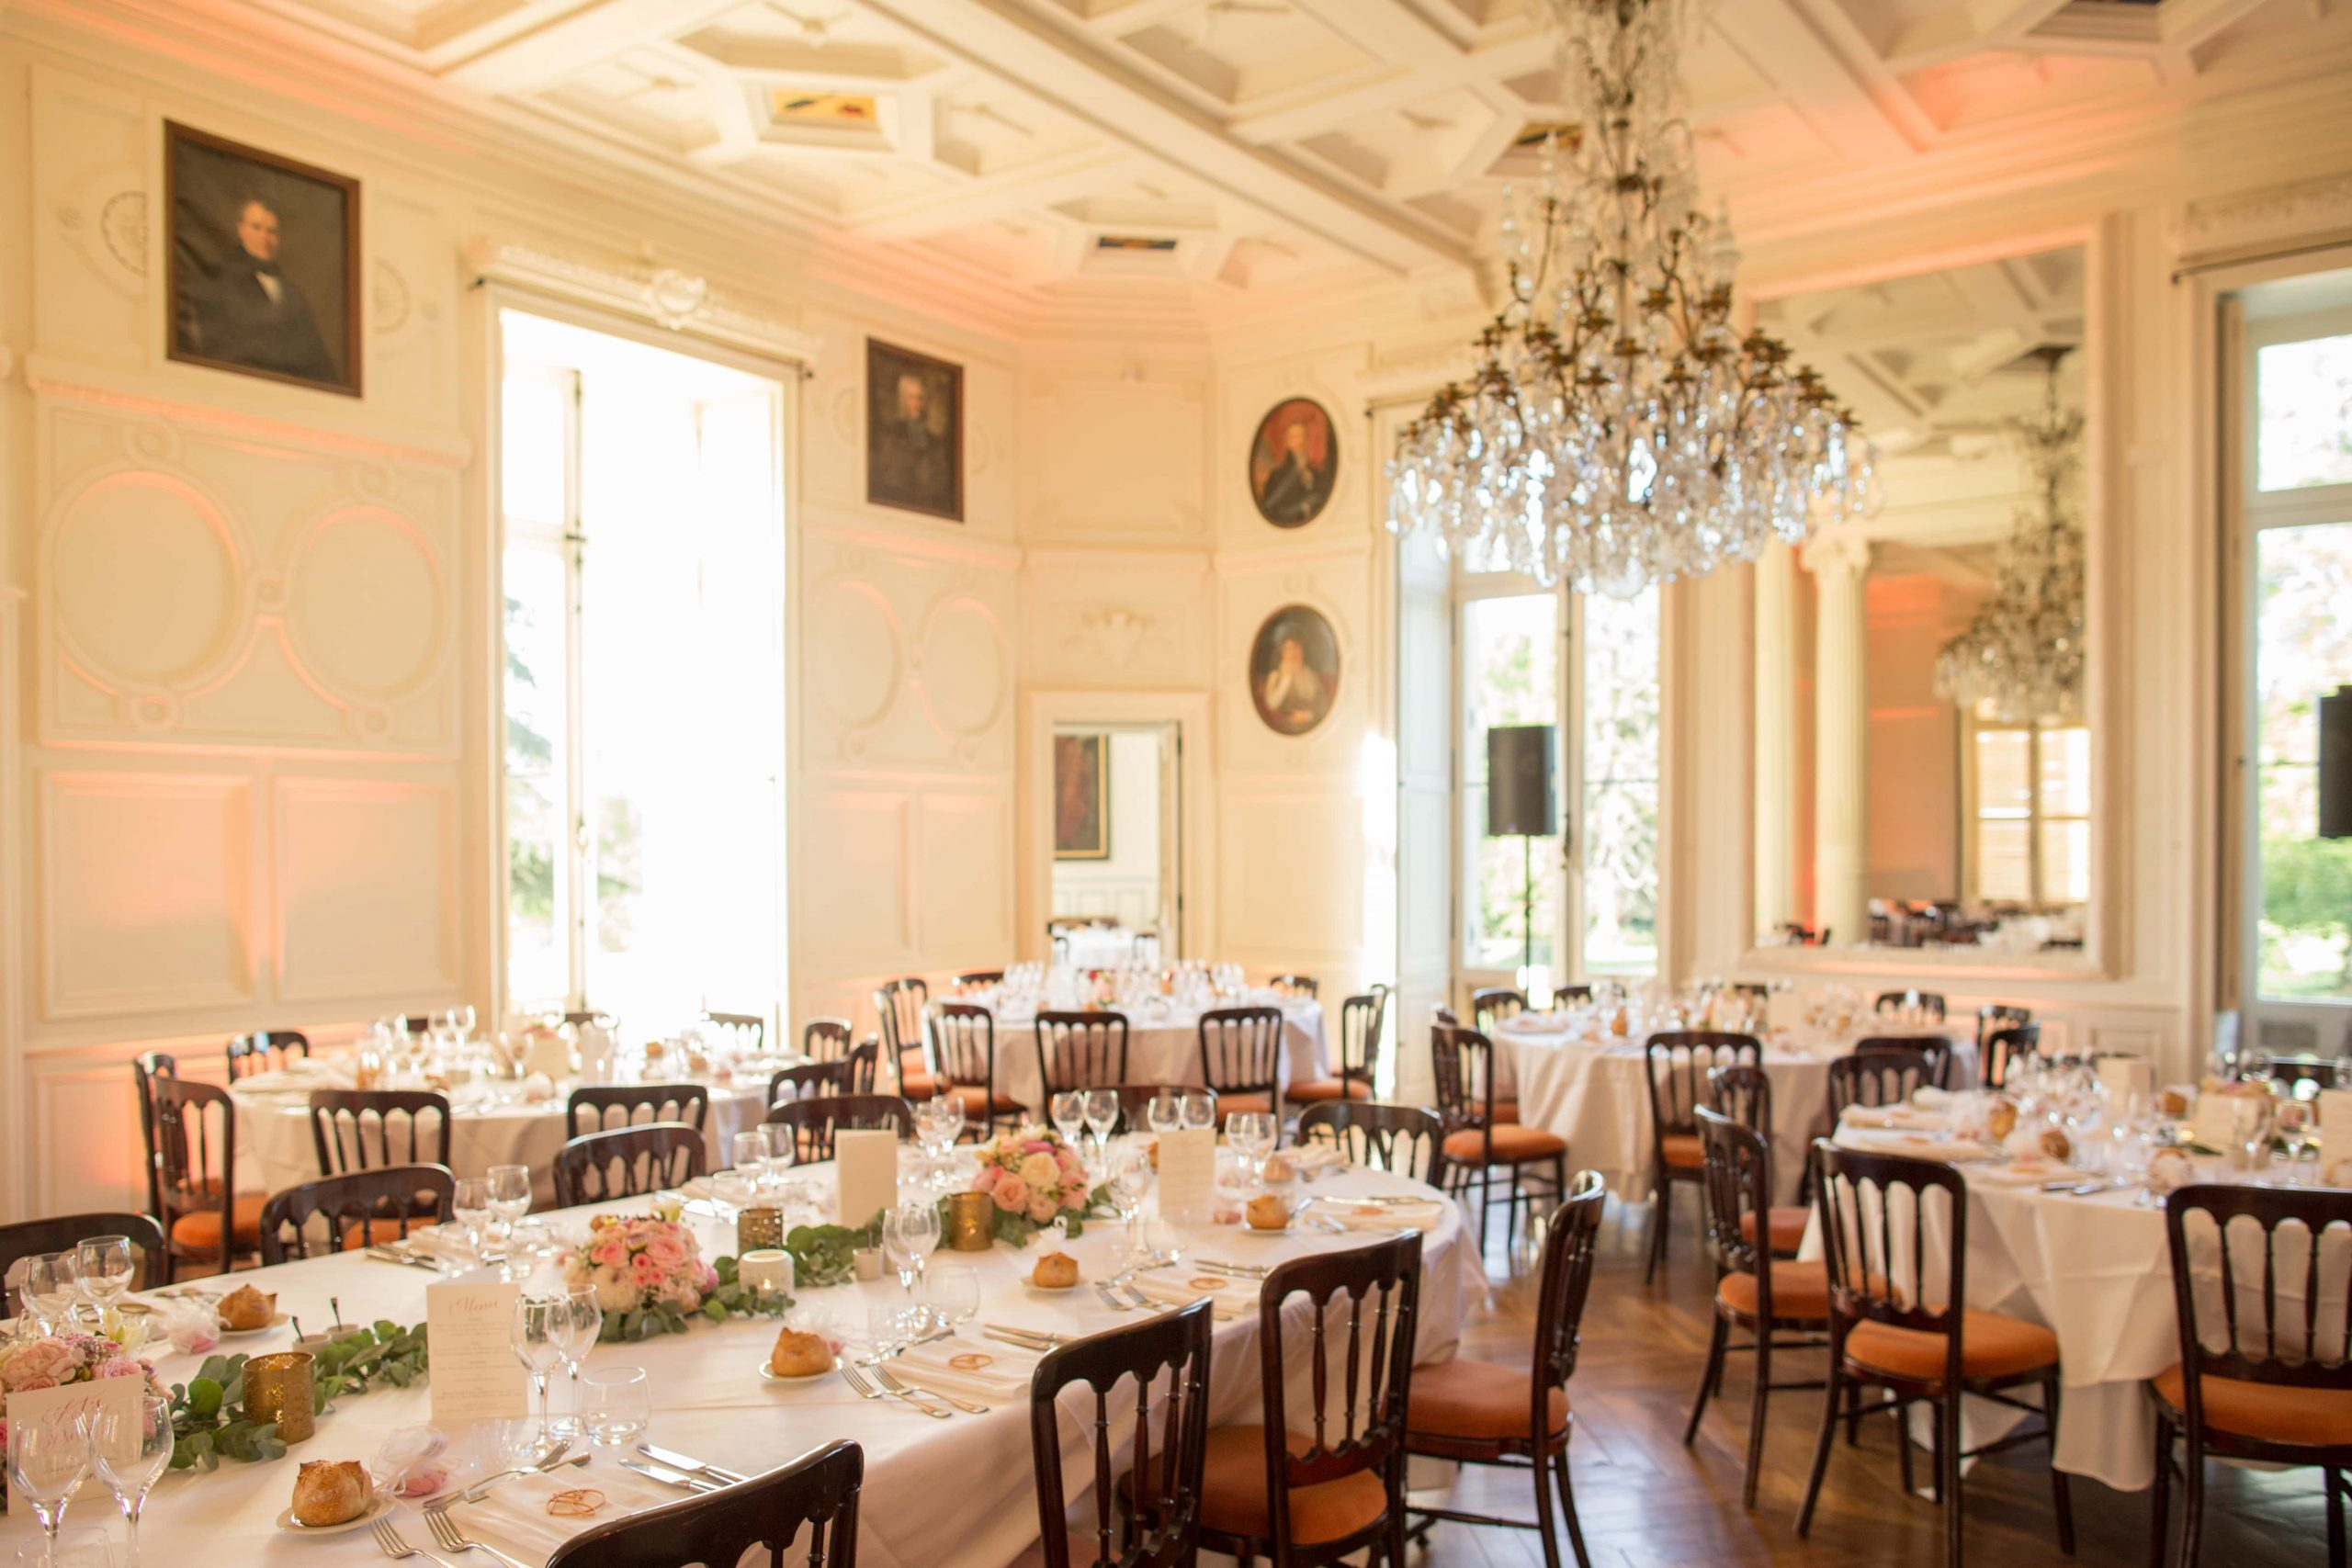 Salle de dîner château d'Azy